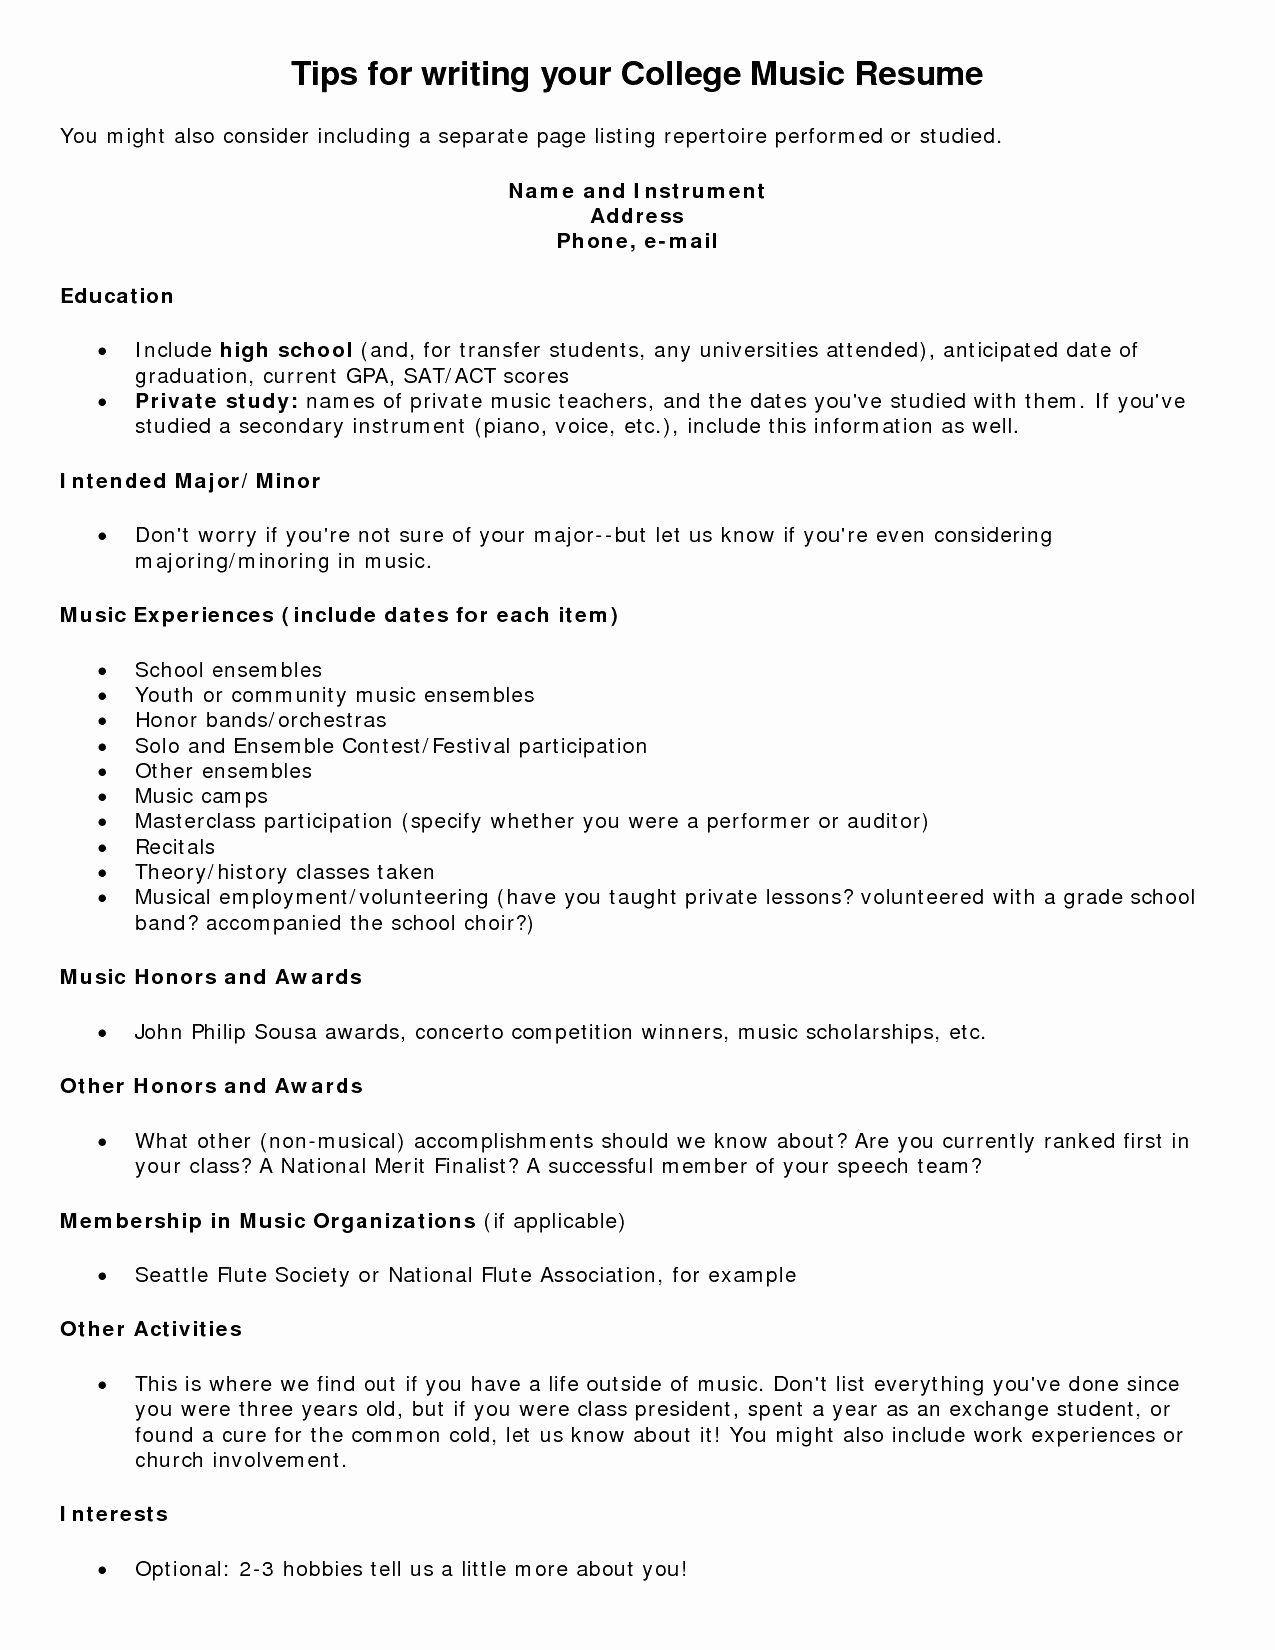 Cnn Students News Worksheet 50 Cnn Students News Worksheet In 2020